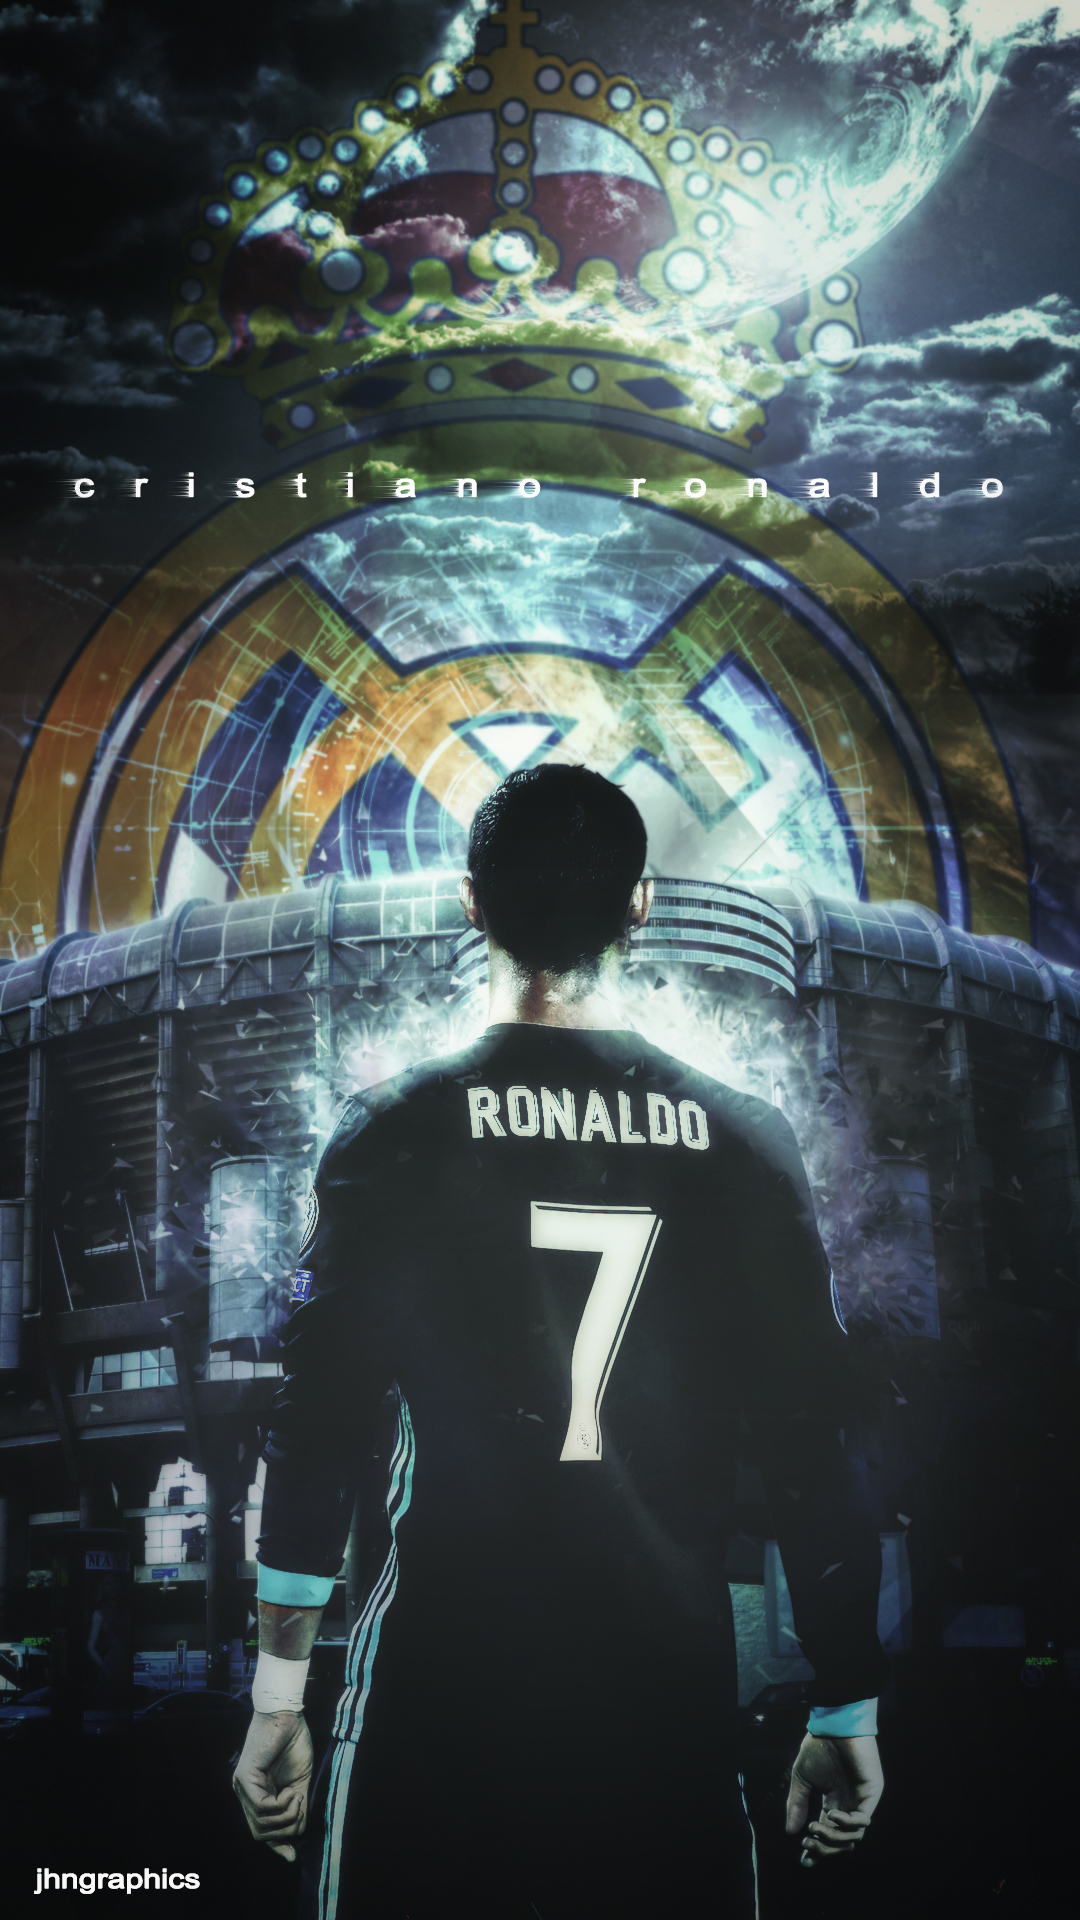 Cristiano Ronaldo Wallpapers On Behance